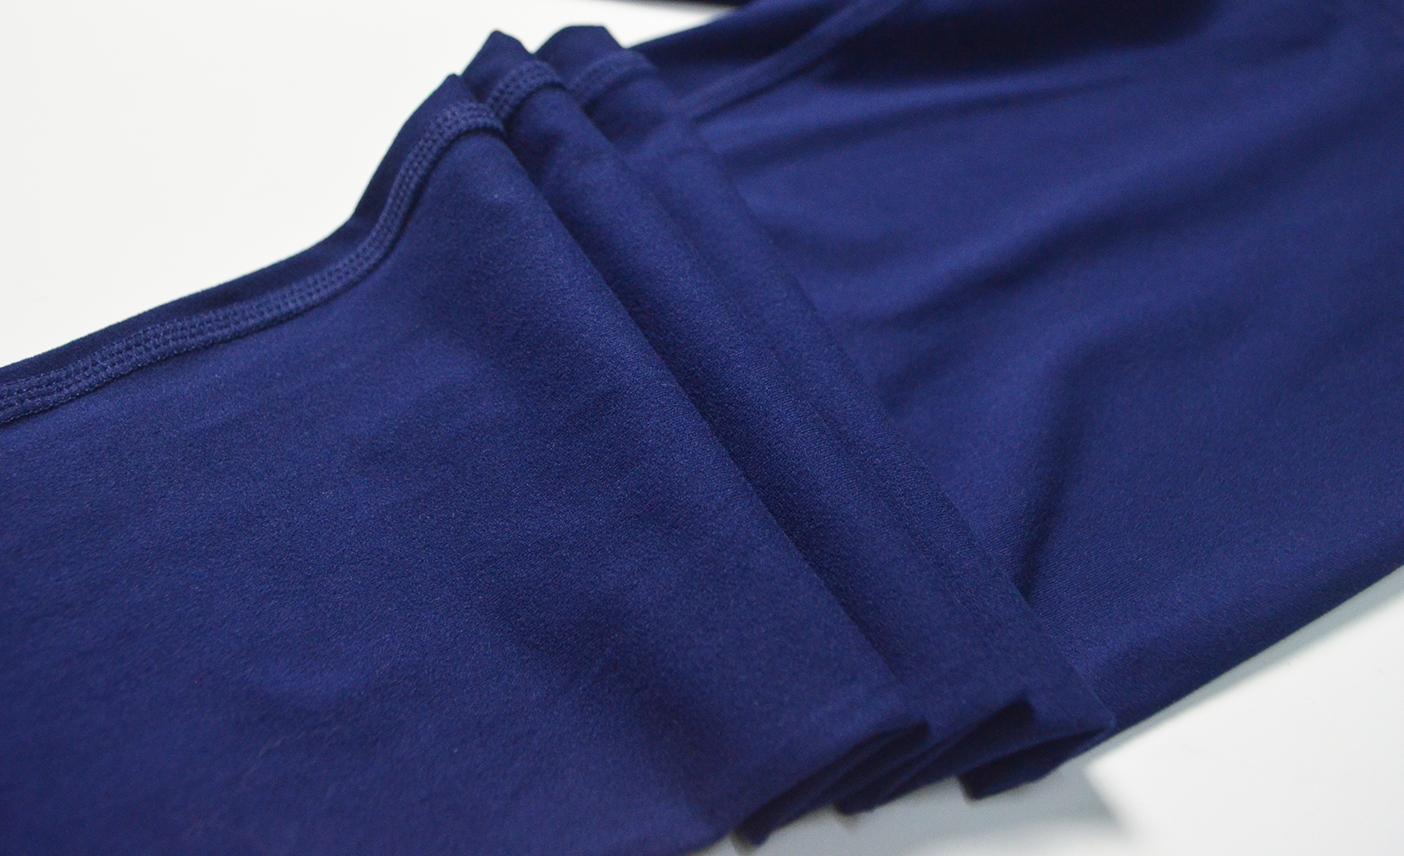 SESEASUN yoga hosen großhandel leggings spandex nahtlose anzug set